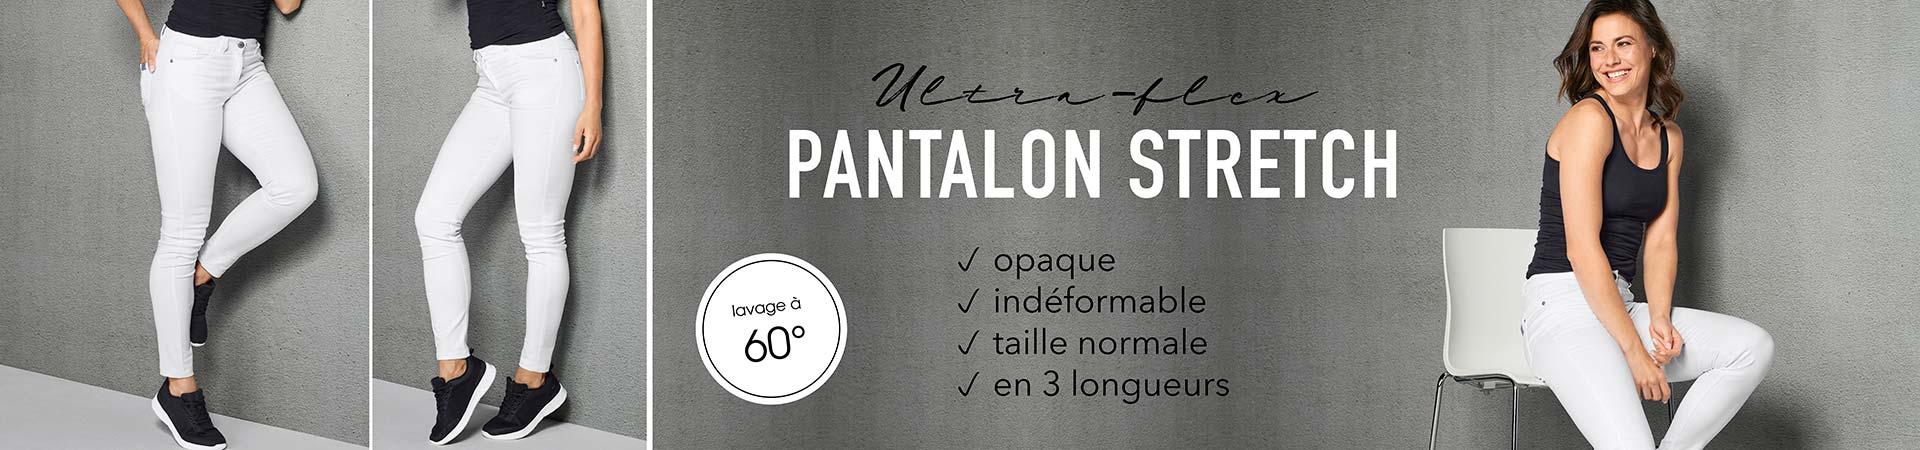 Pantalon stretch-ultraflex, opaque